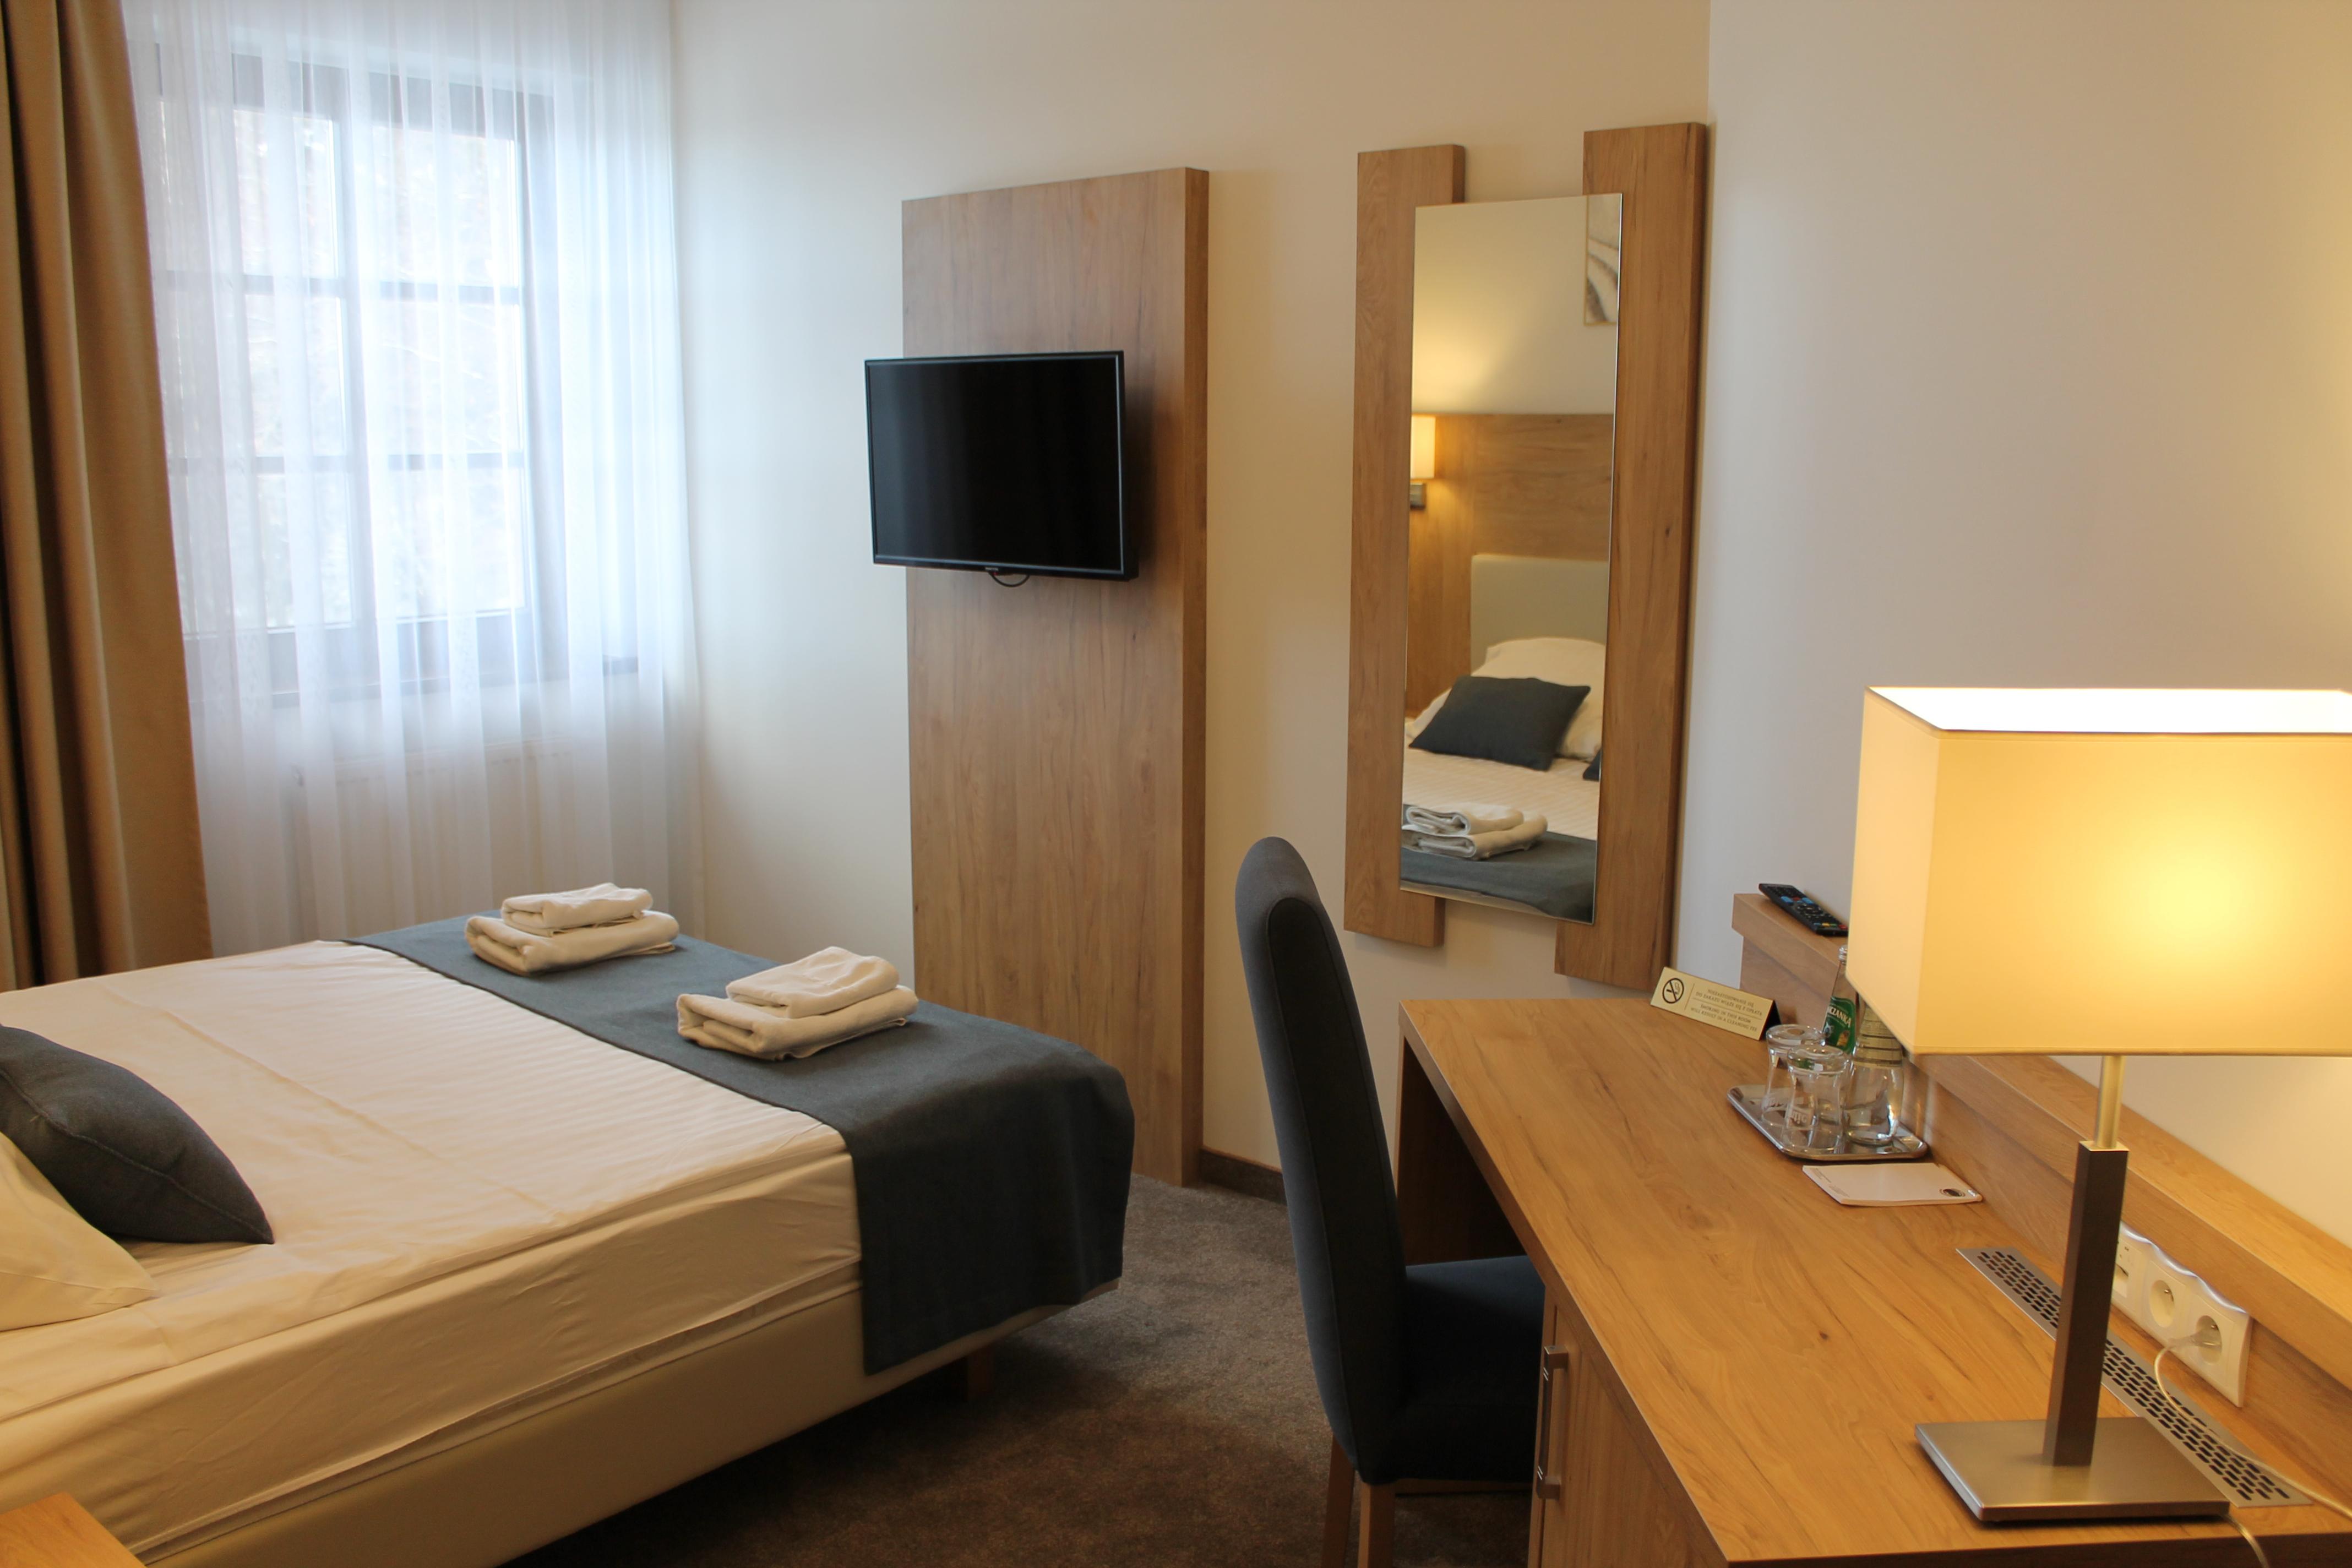 http://www.hotel-lipnica.pl/wp-content/uploads/2020/02/01_02-2.jpg